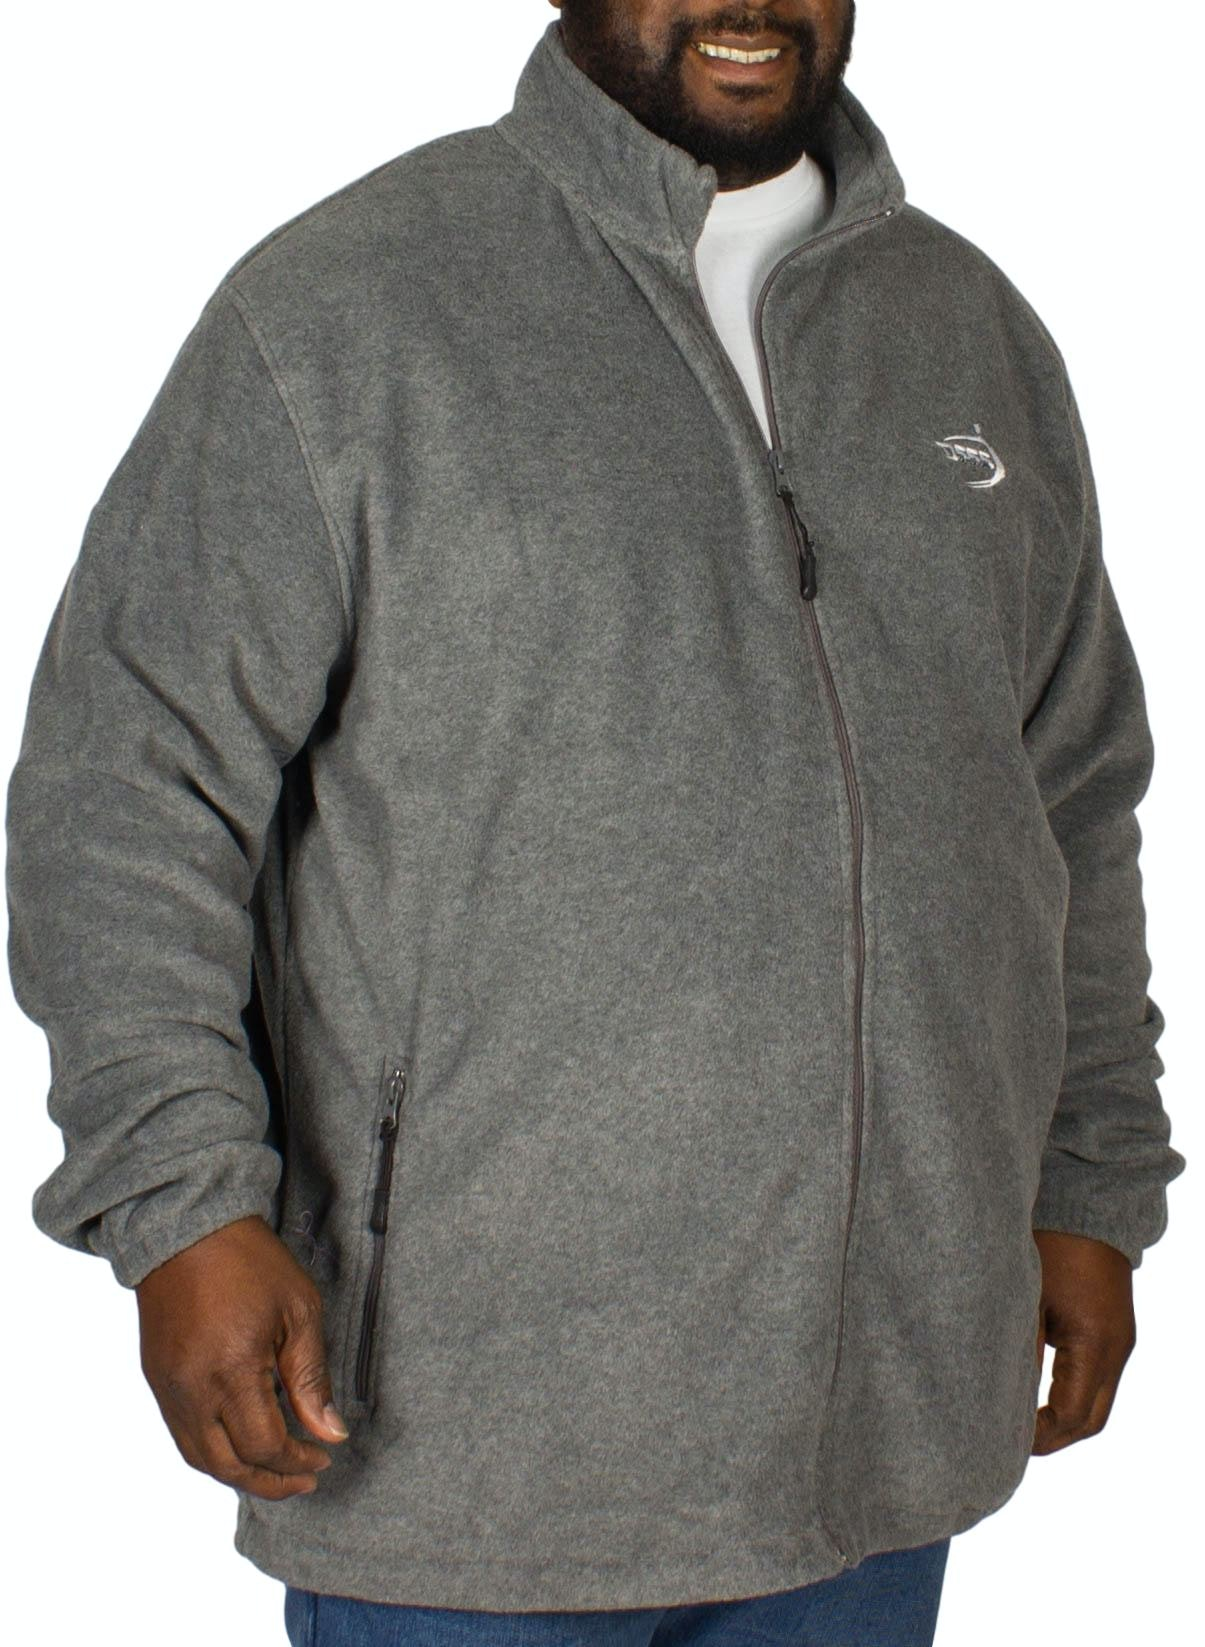 D555 Mackenzie Fleece Jacket Charcoal